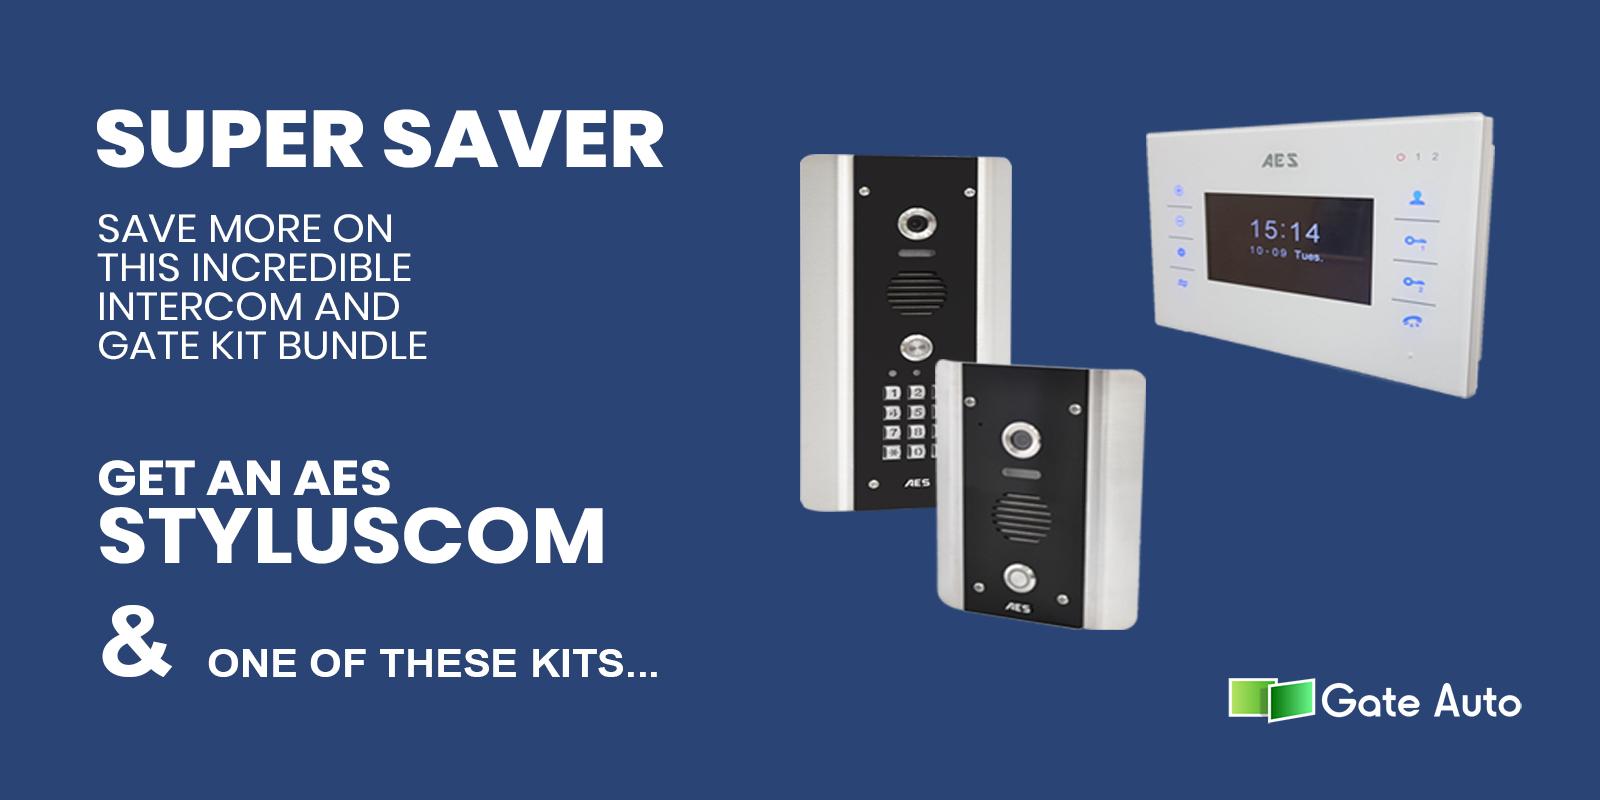 super saver gate kit bundle